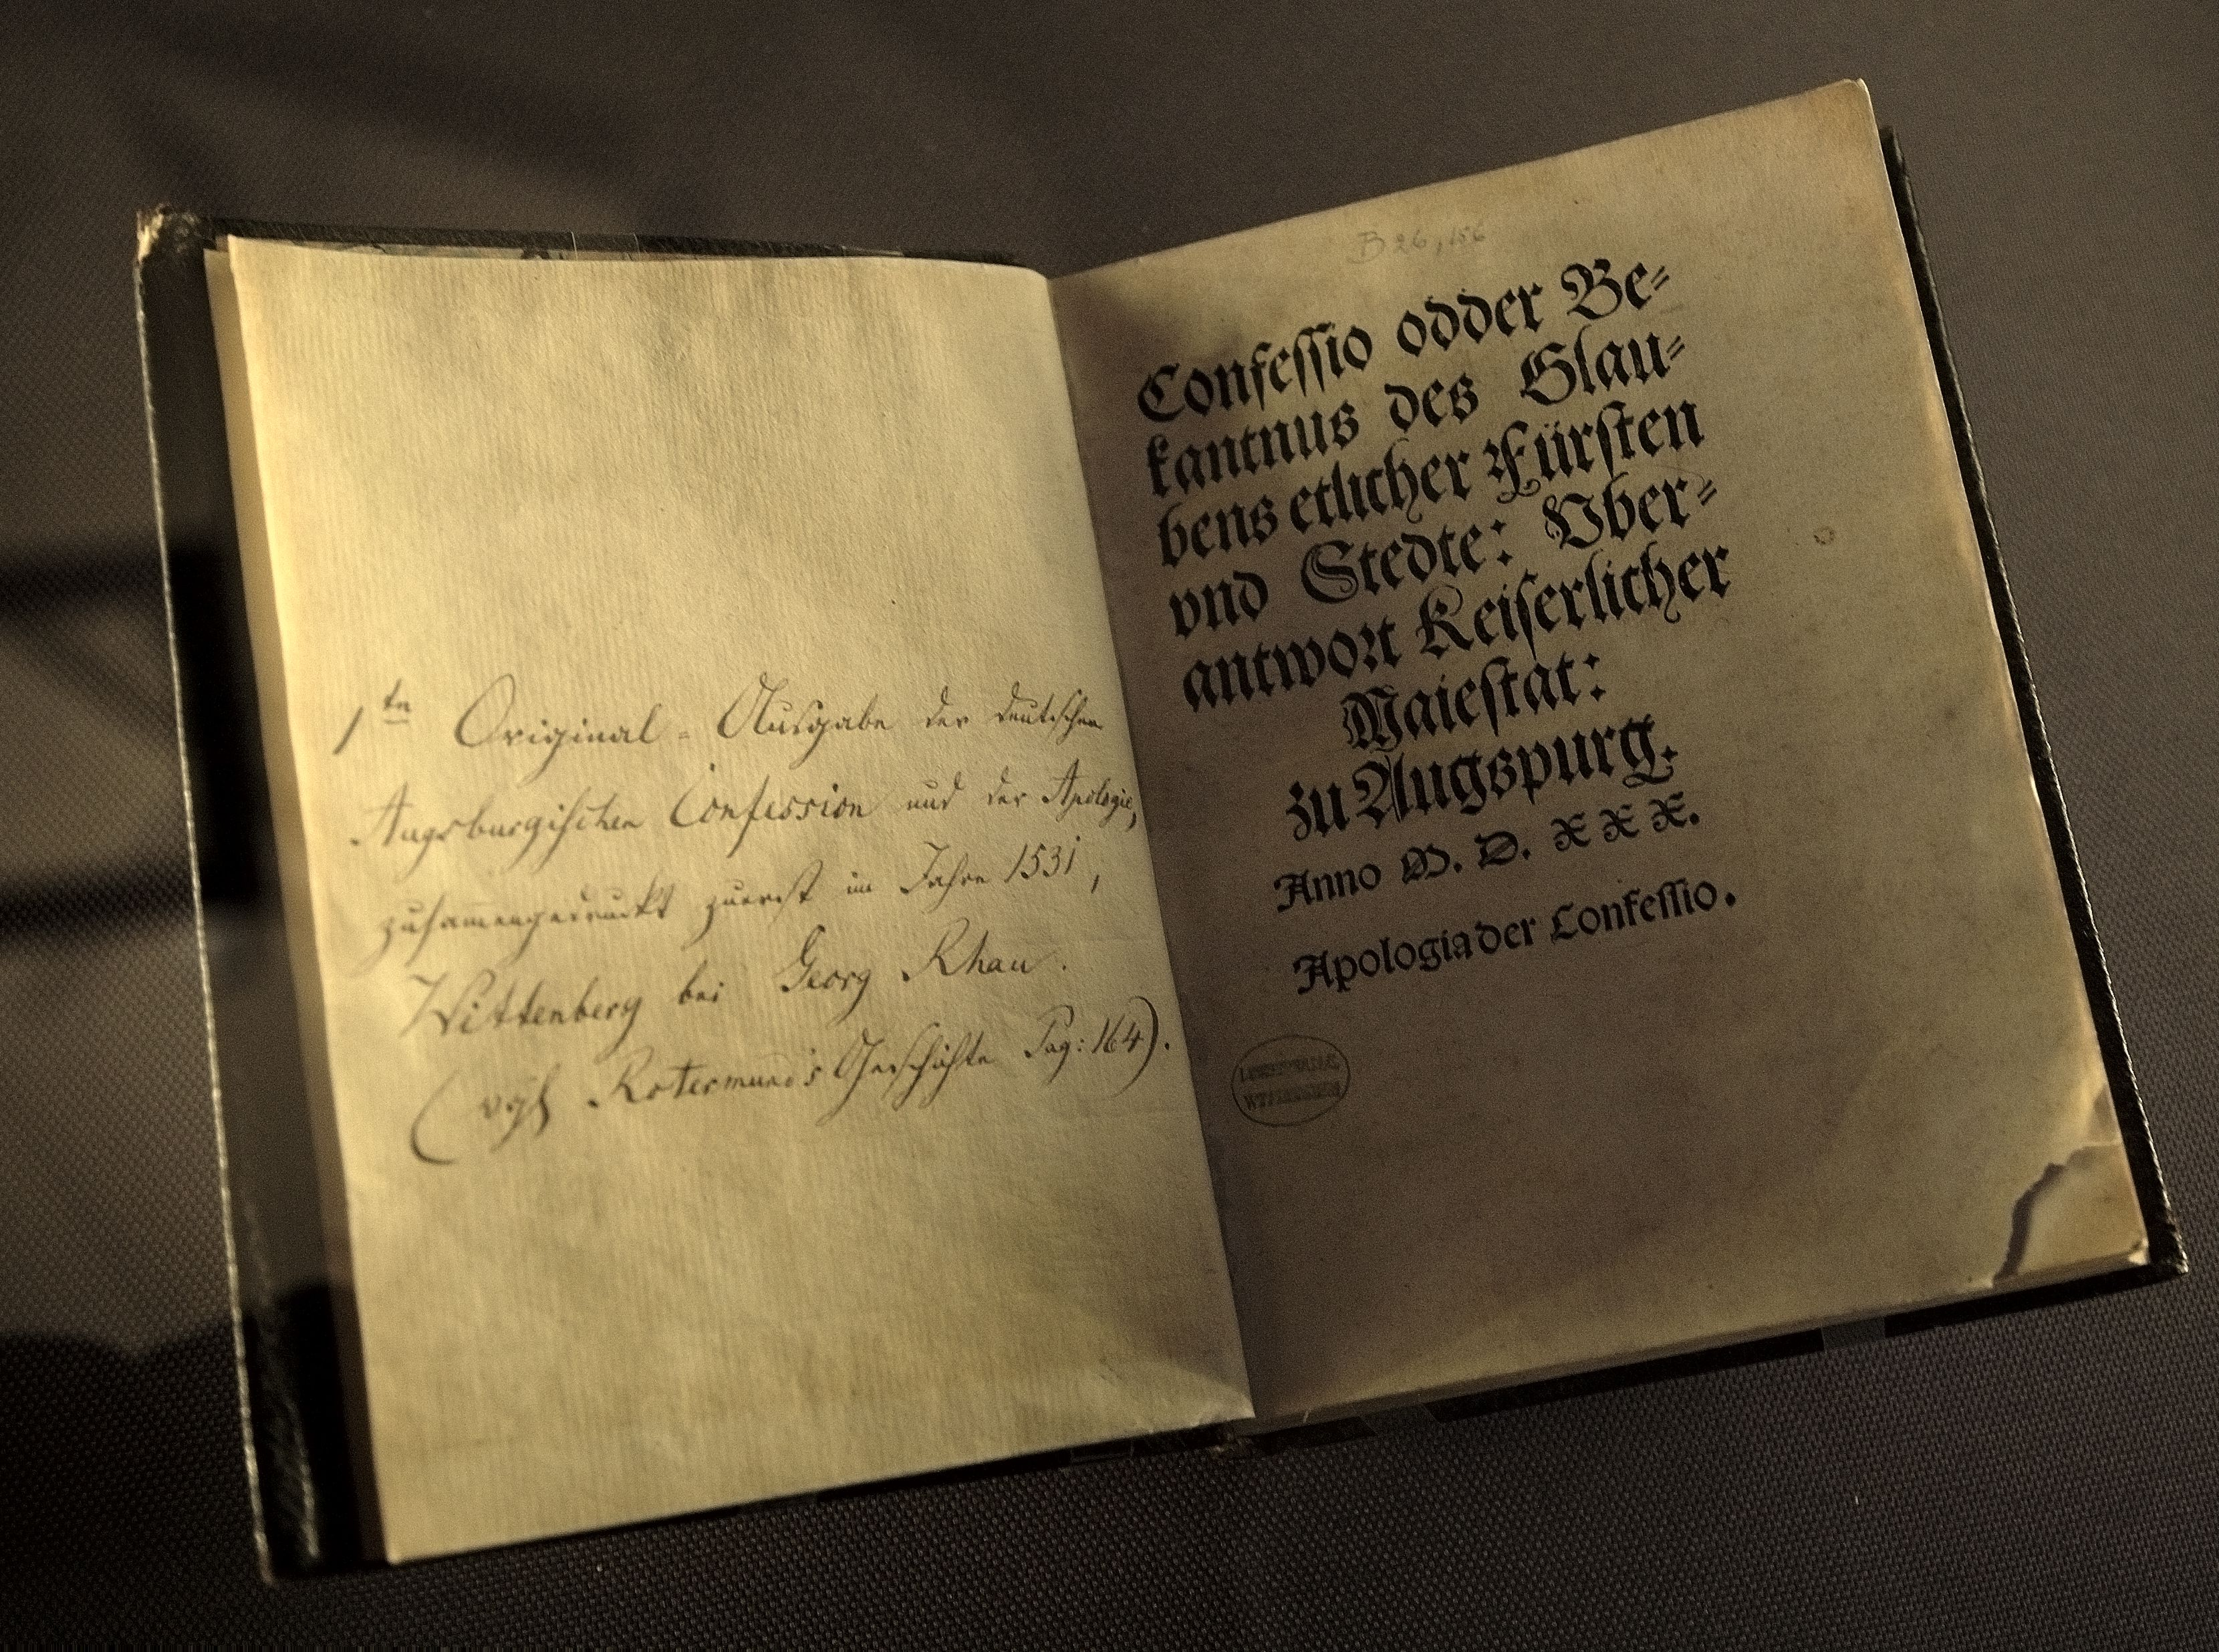 Augsburg Confession Booklet Download